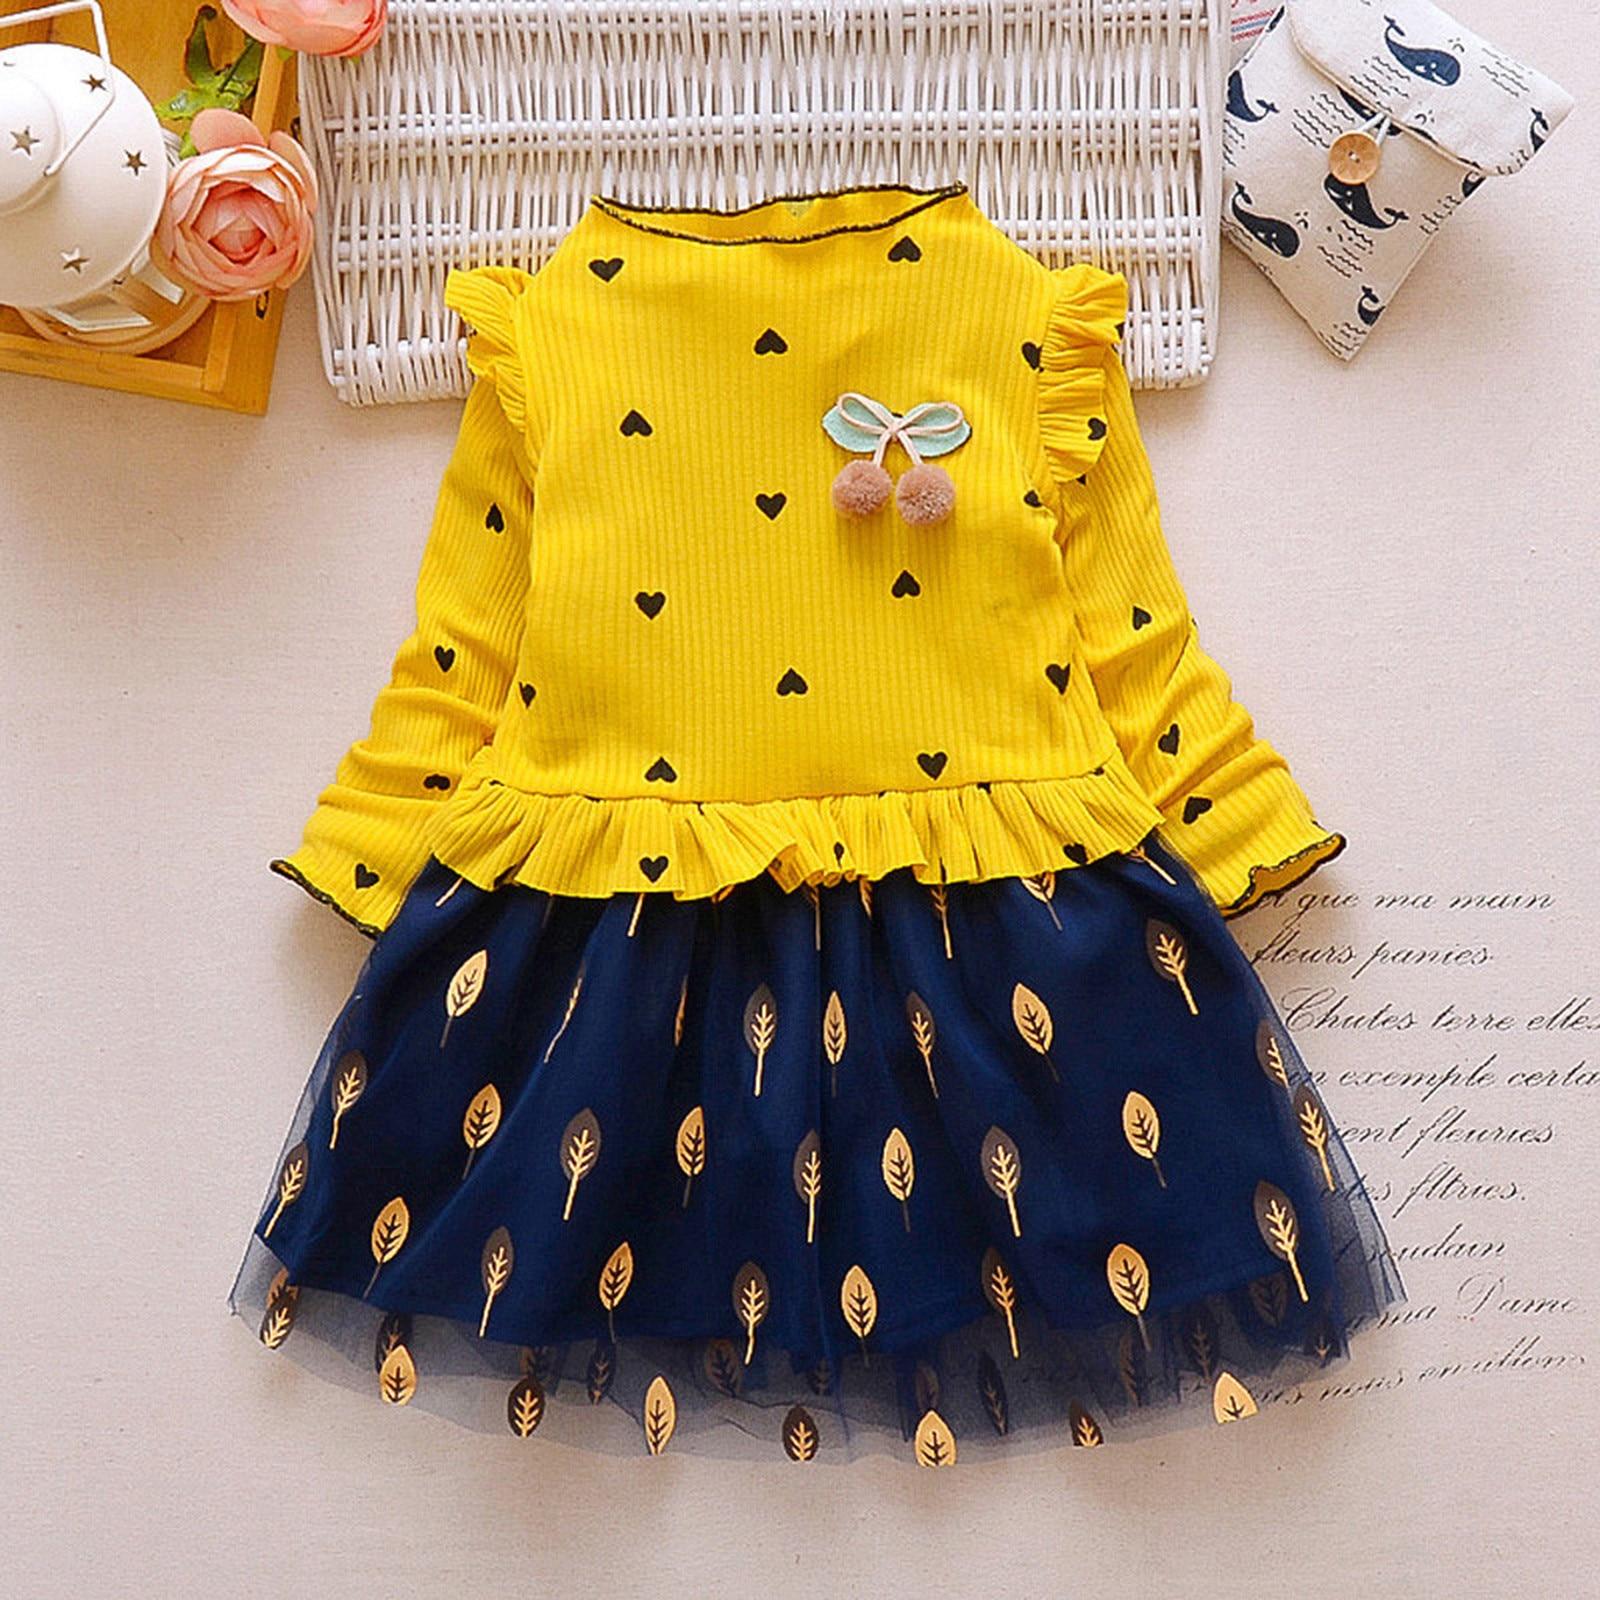 40# Toddler Kids Dresses Baby Girls' Long-sleeved Leaf Net Yarn Stitching Dress Love Dress Kids Clothes Girls תחפושות לתינוקות 2